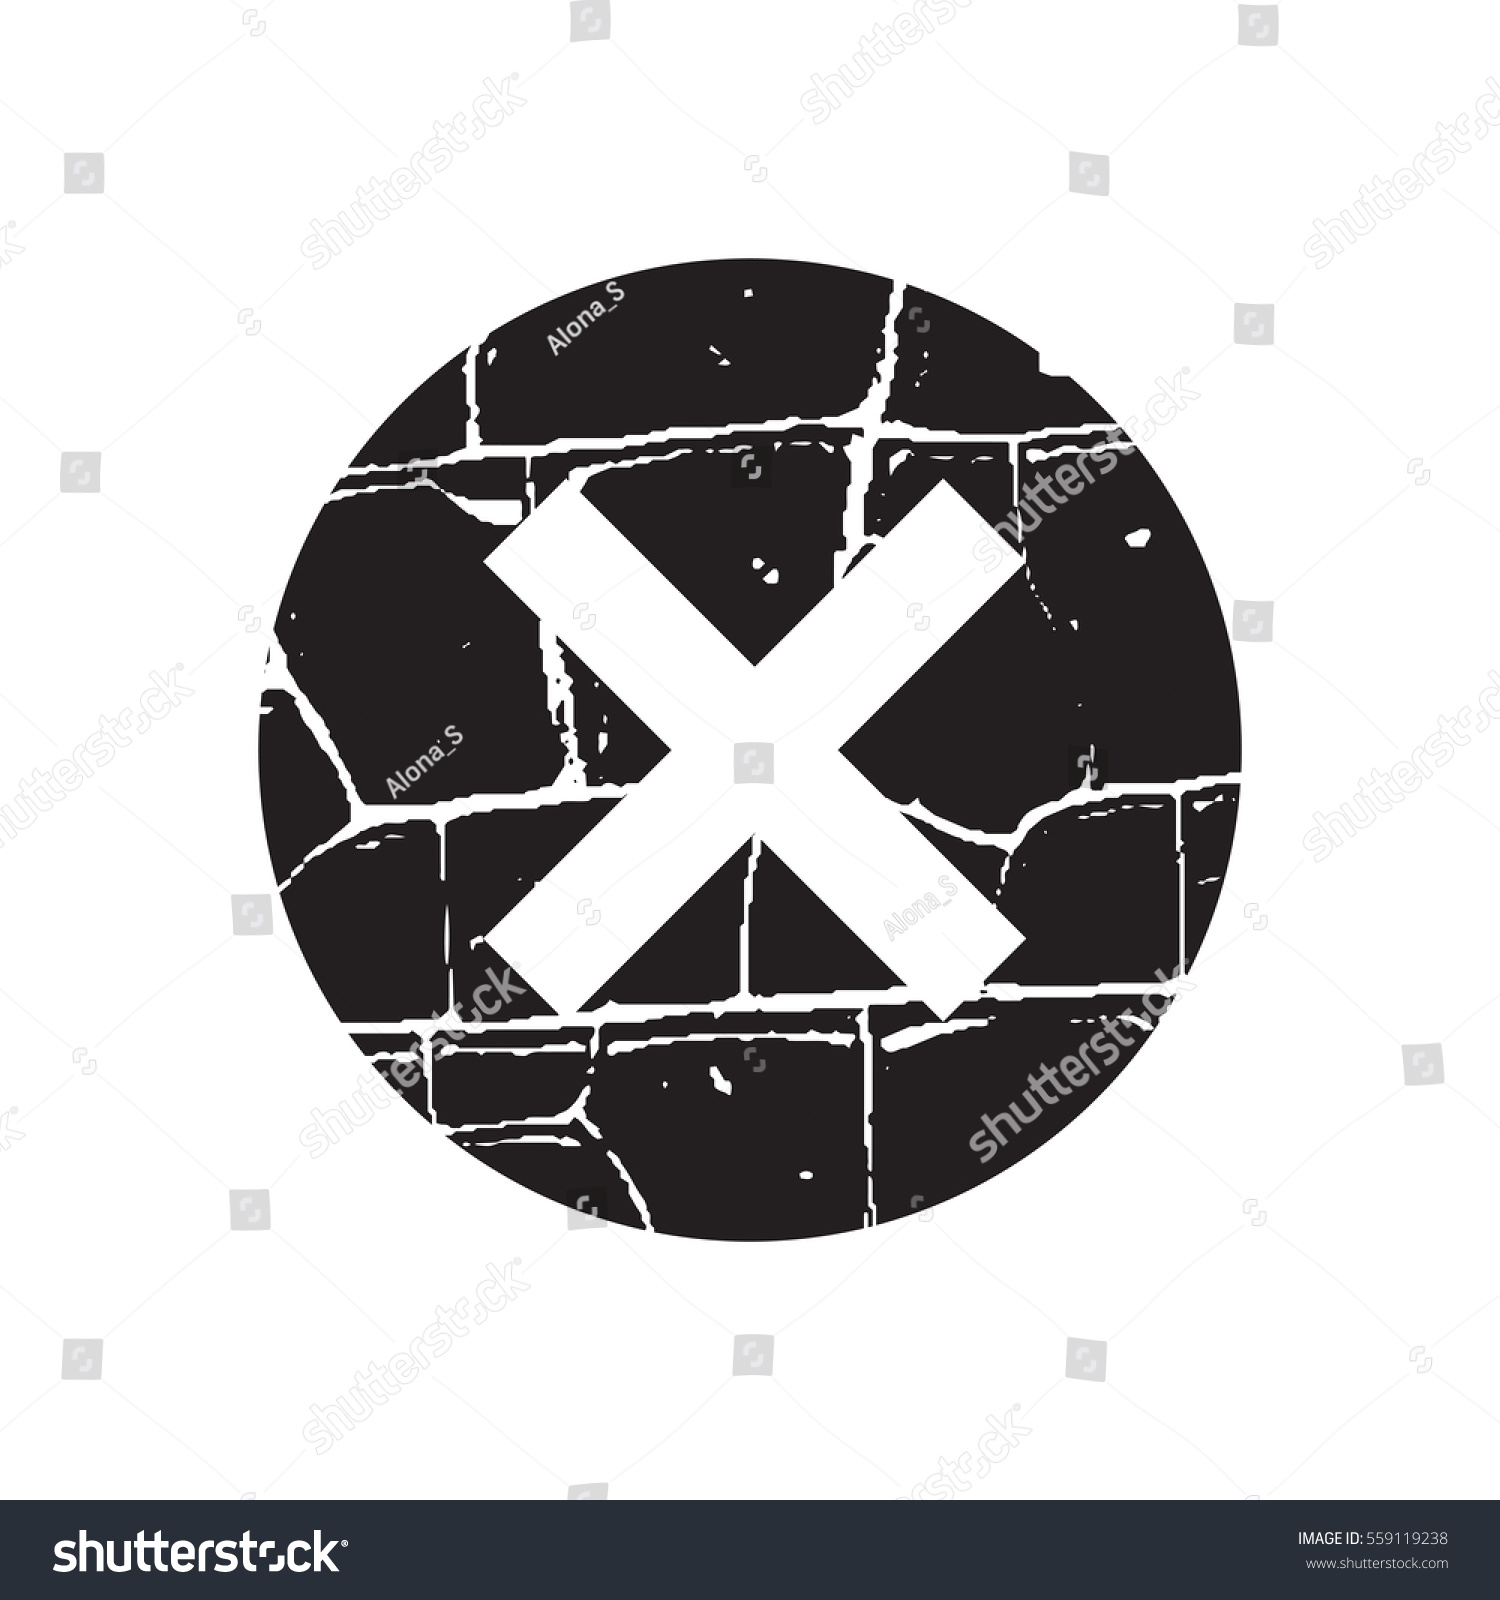 Cross Sign Black Element Gray Grunge Stock Vector Royalty Free